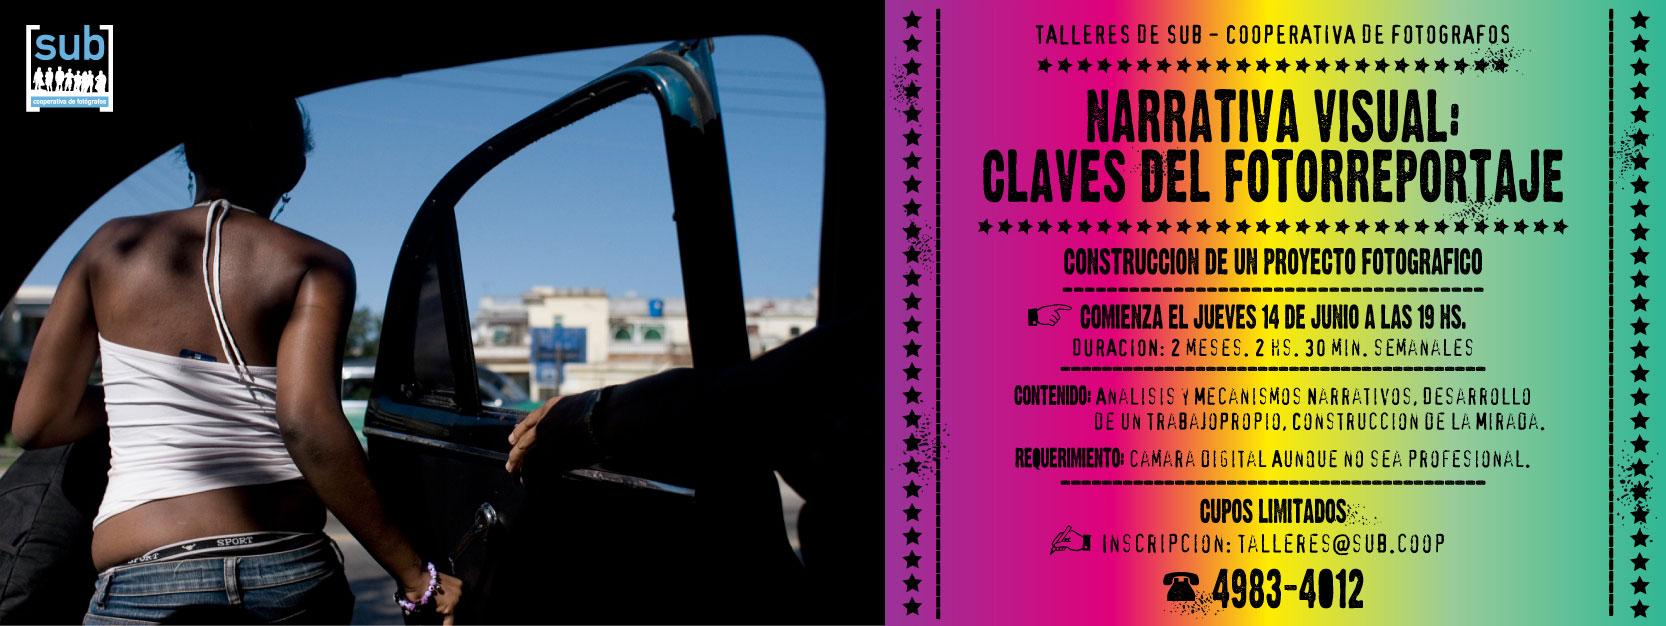 Flyer Narrativa 2012